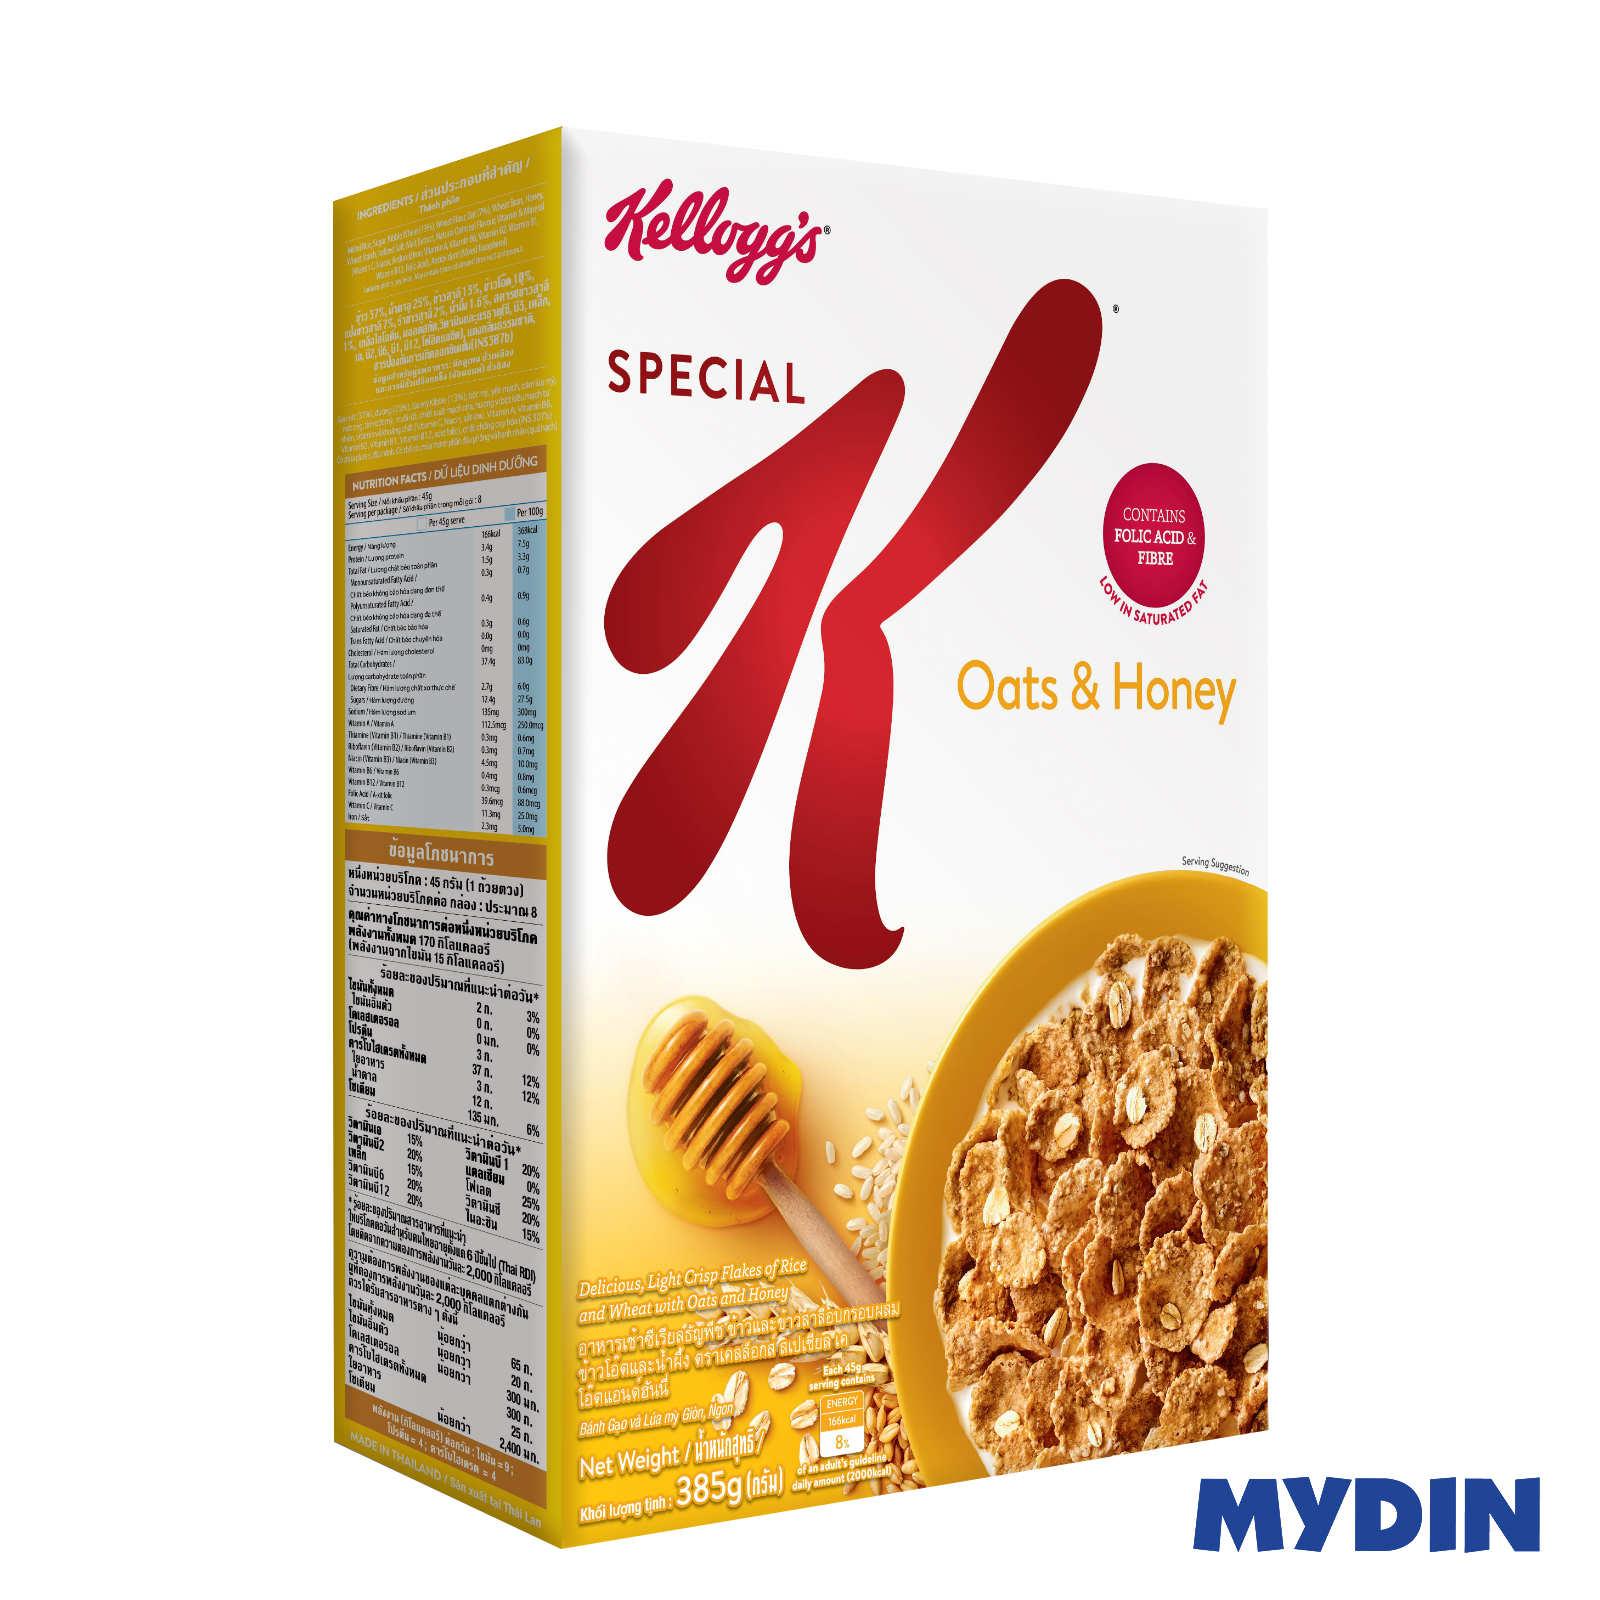 Kellogg's Special K Oats & Honey (385g)